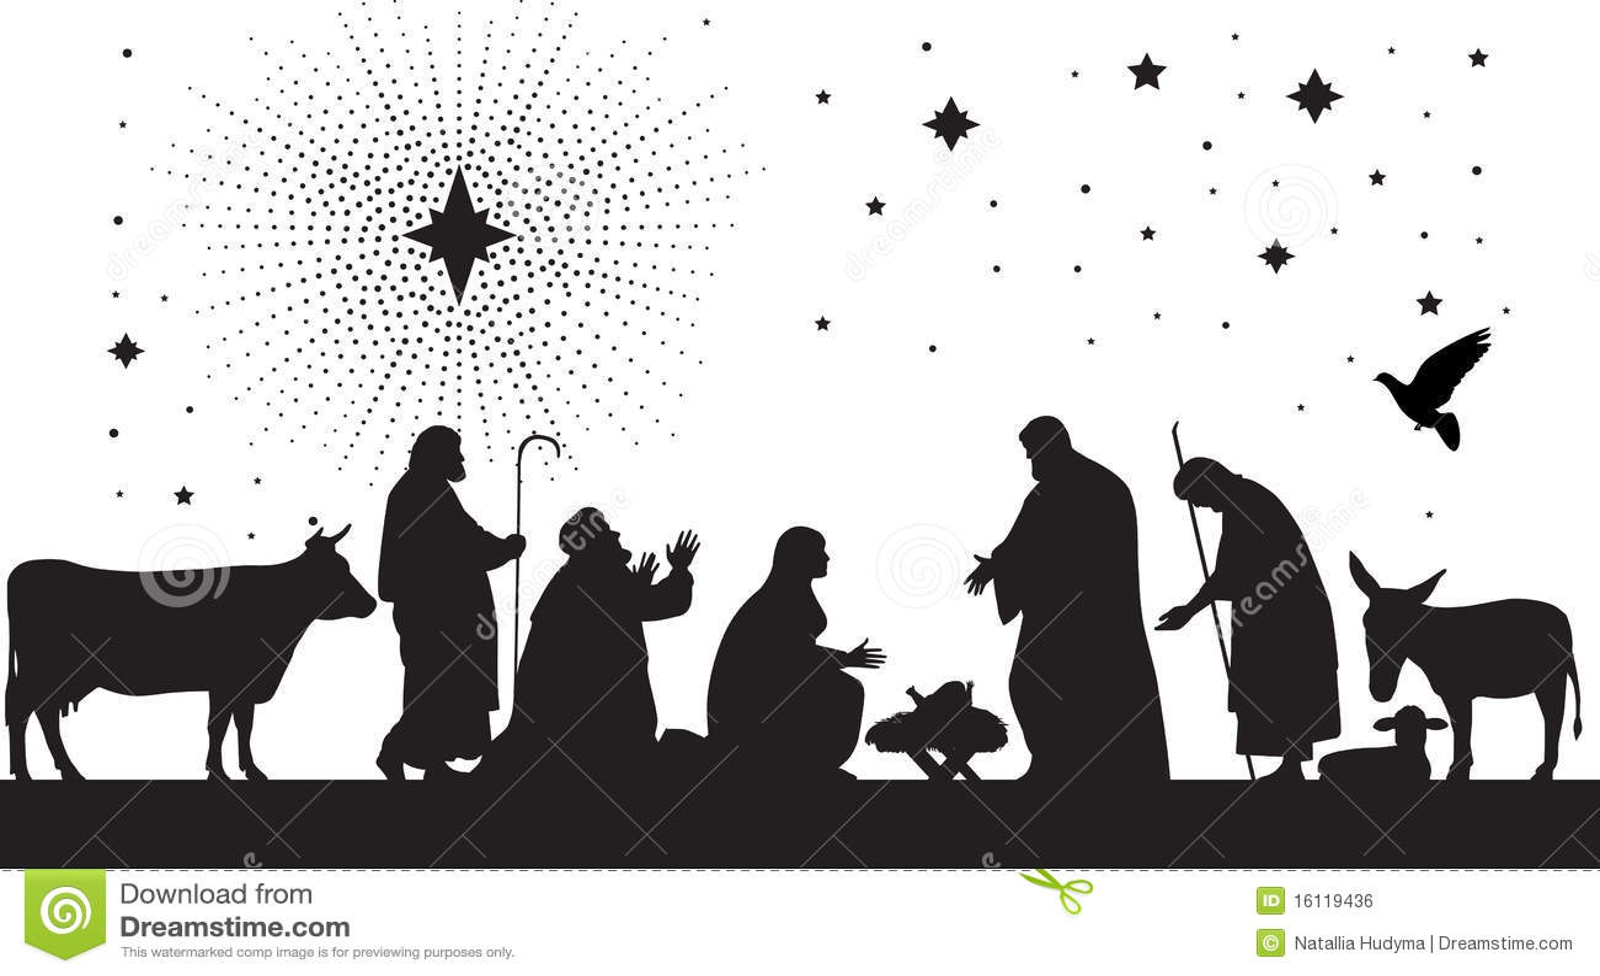 Étoile de Bethlehem.